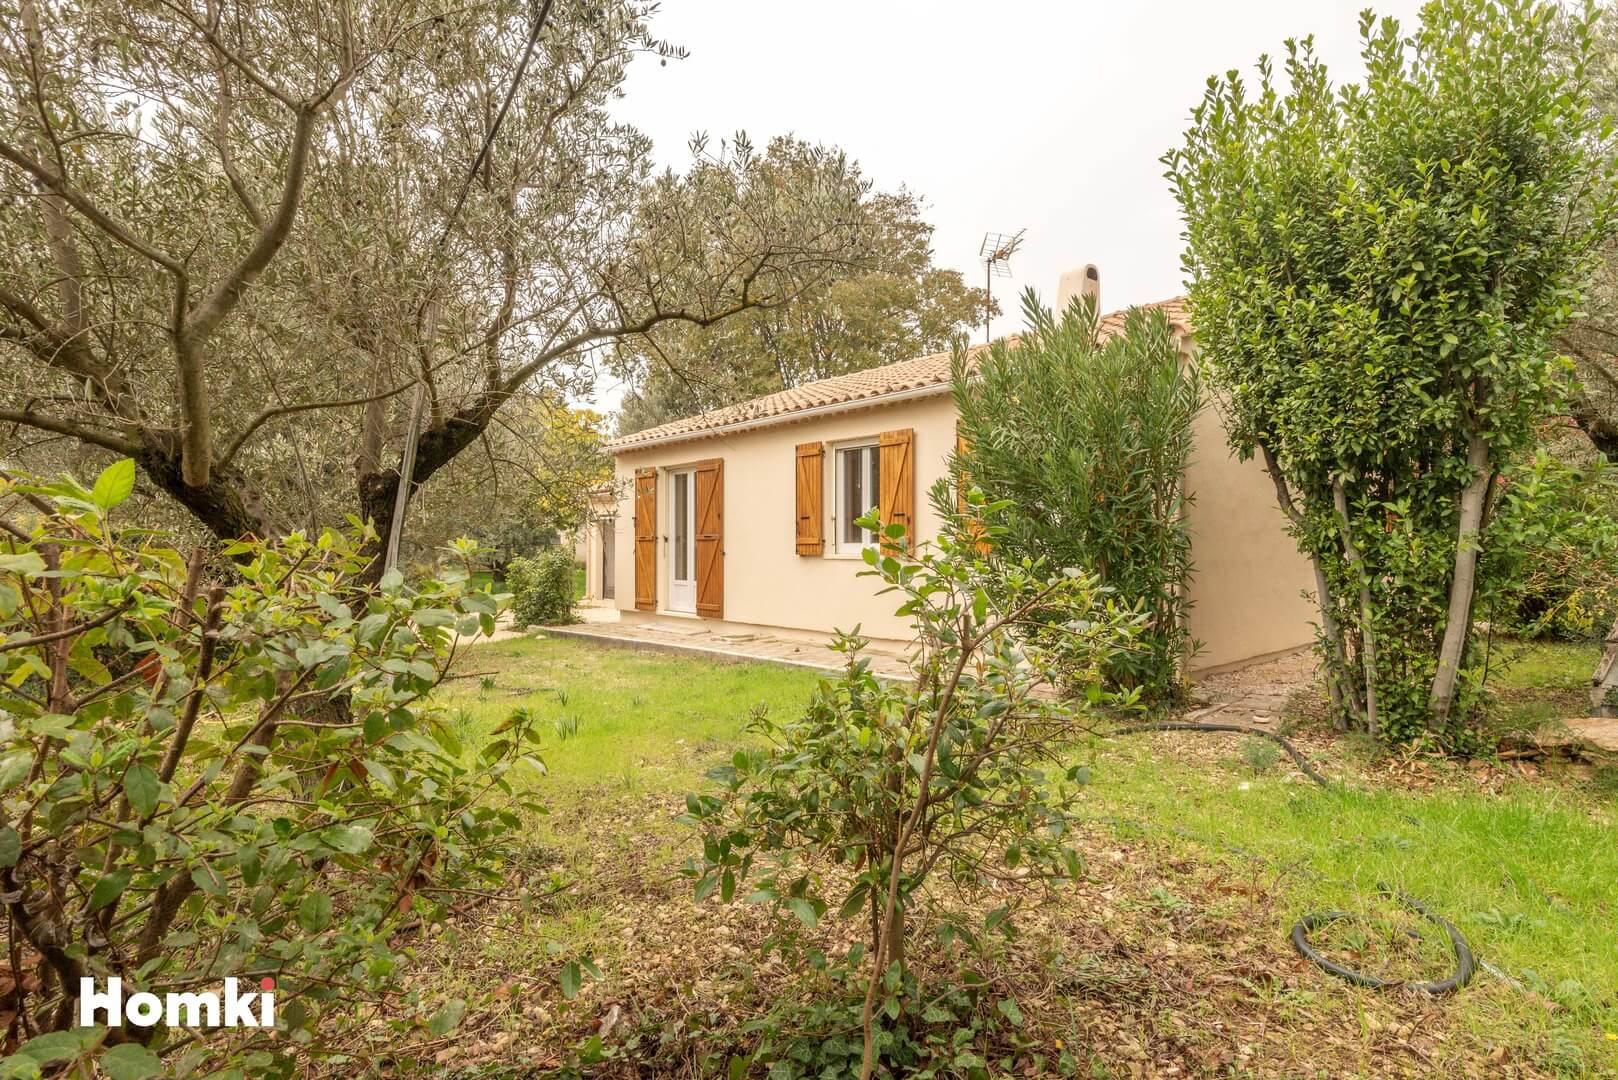 Homki - Vente Maison/villa  de 74.0 m² à Mornas 84550